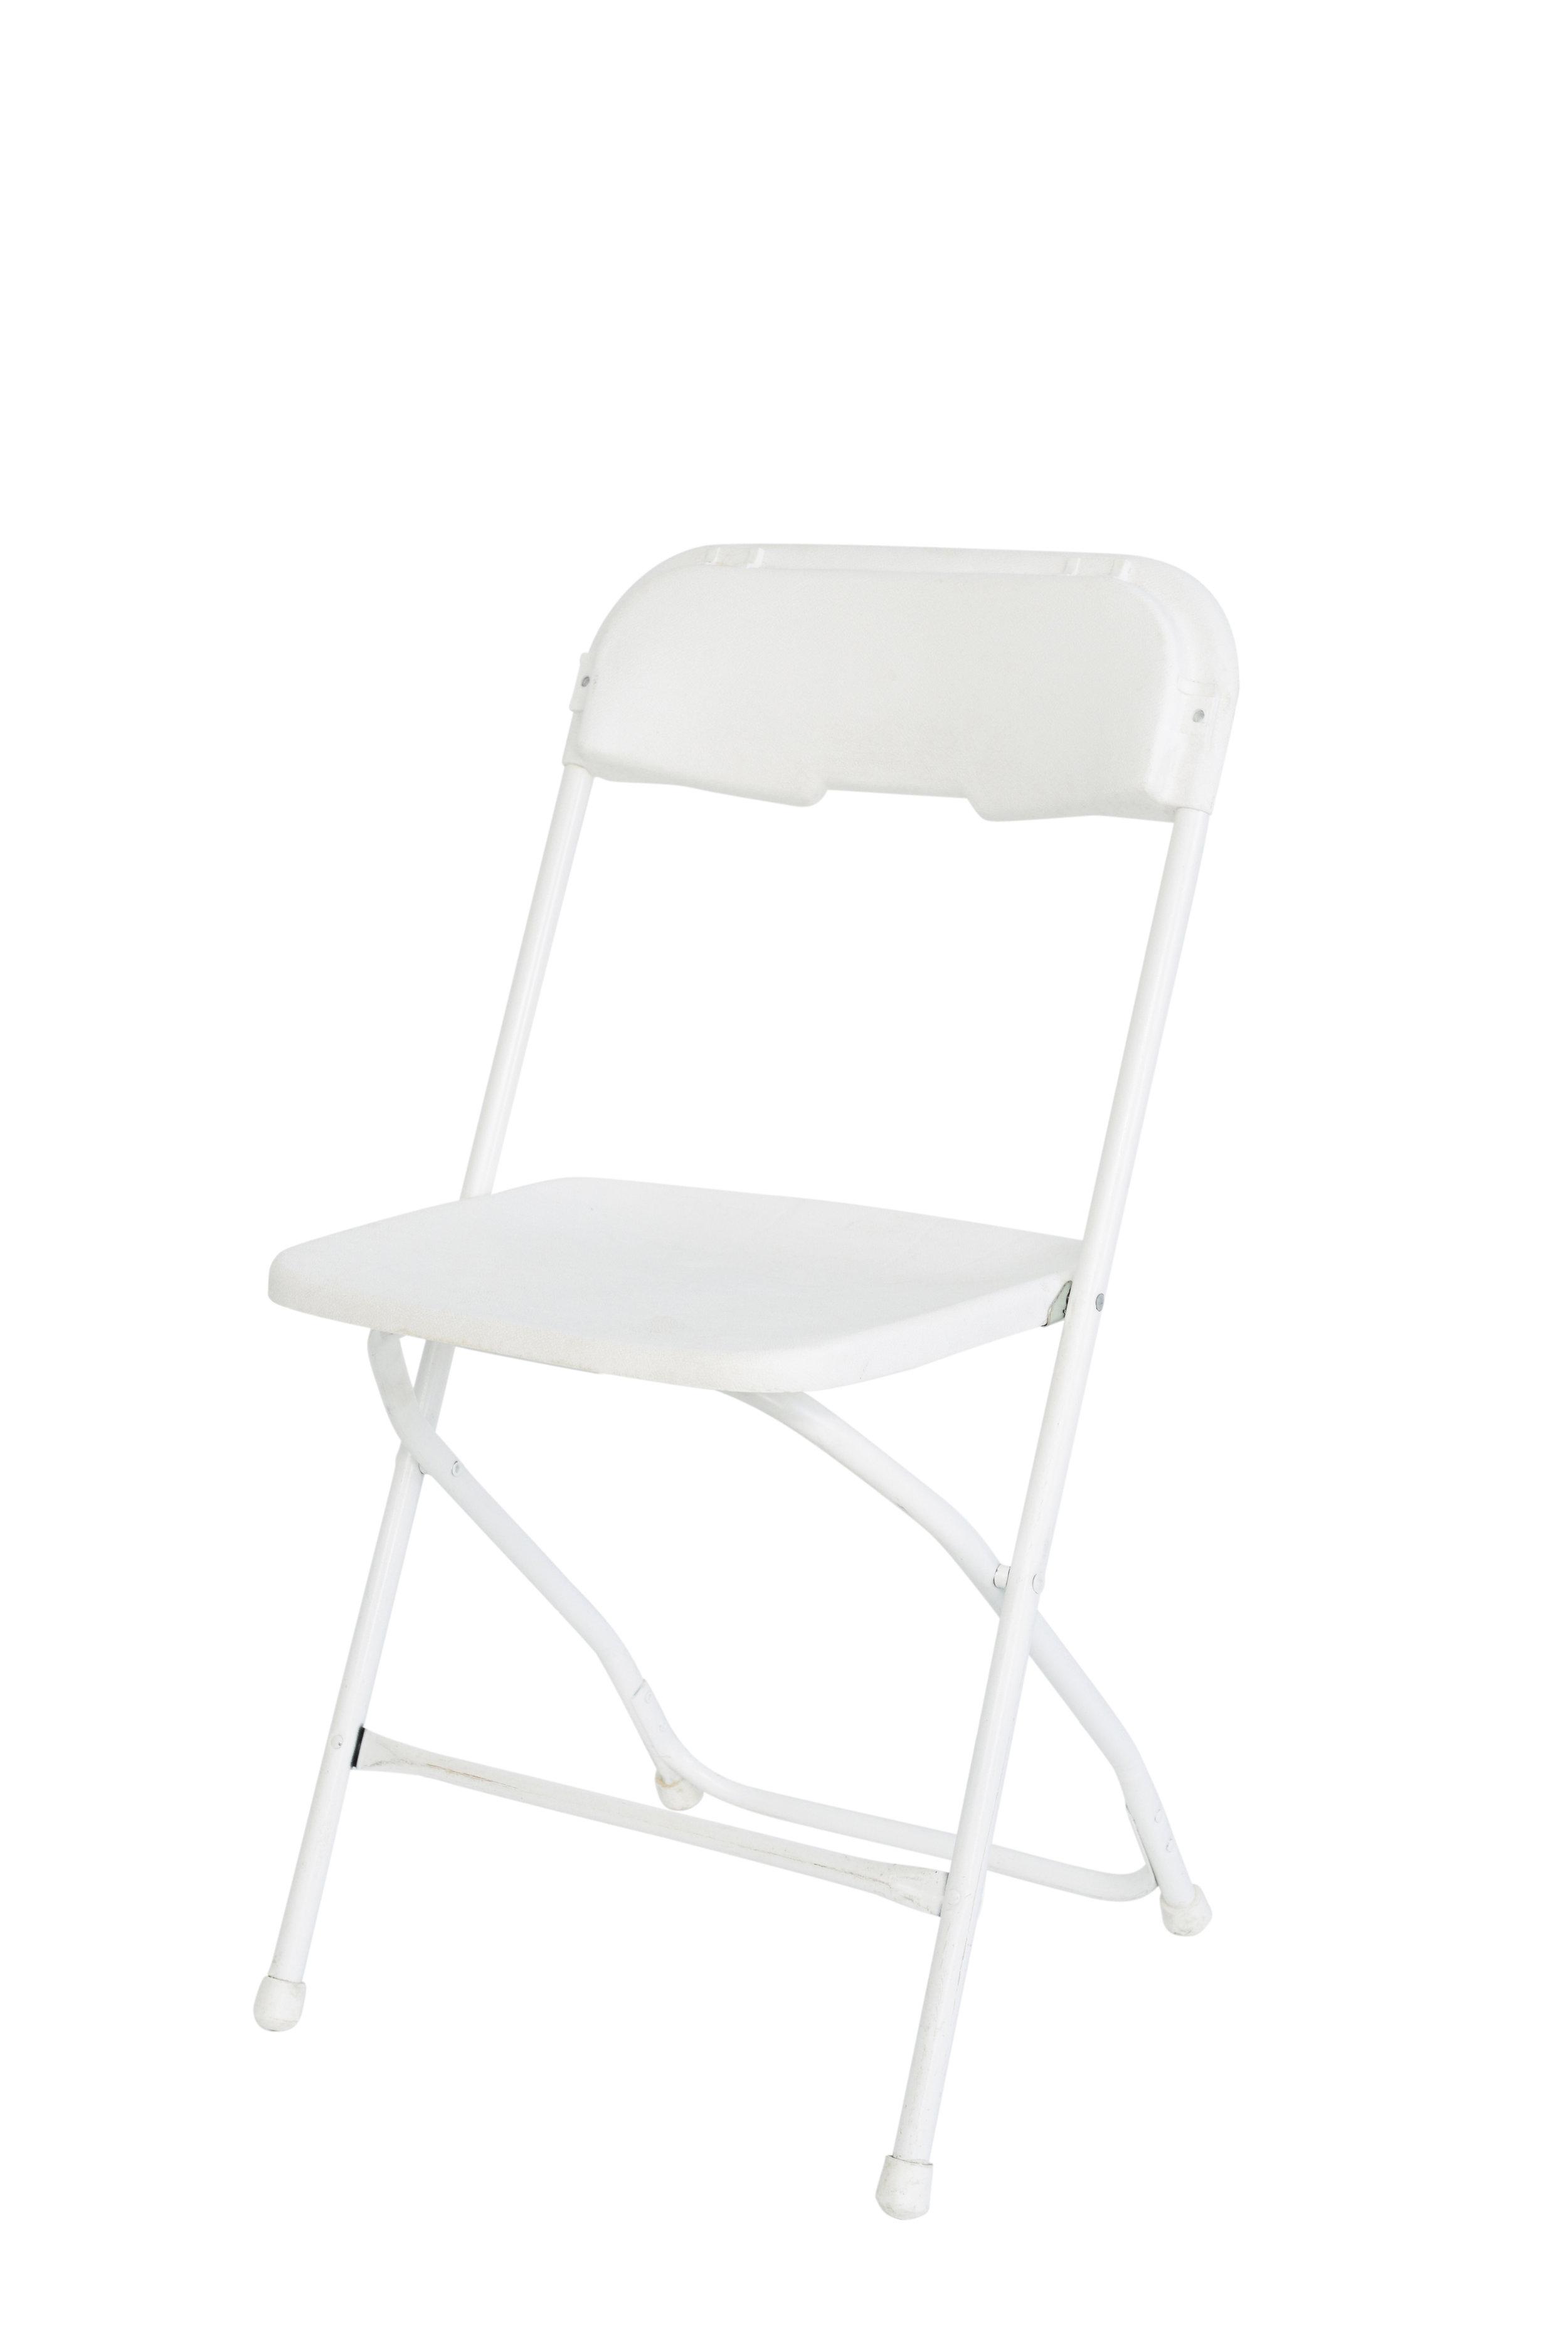 White folding chairs qty. 45